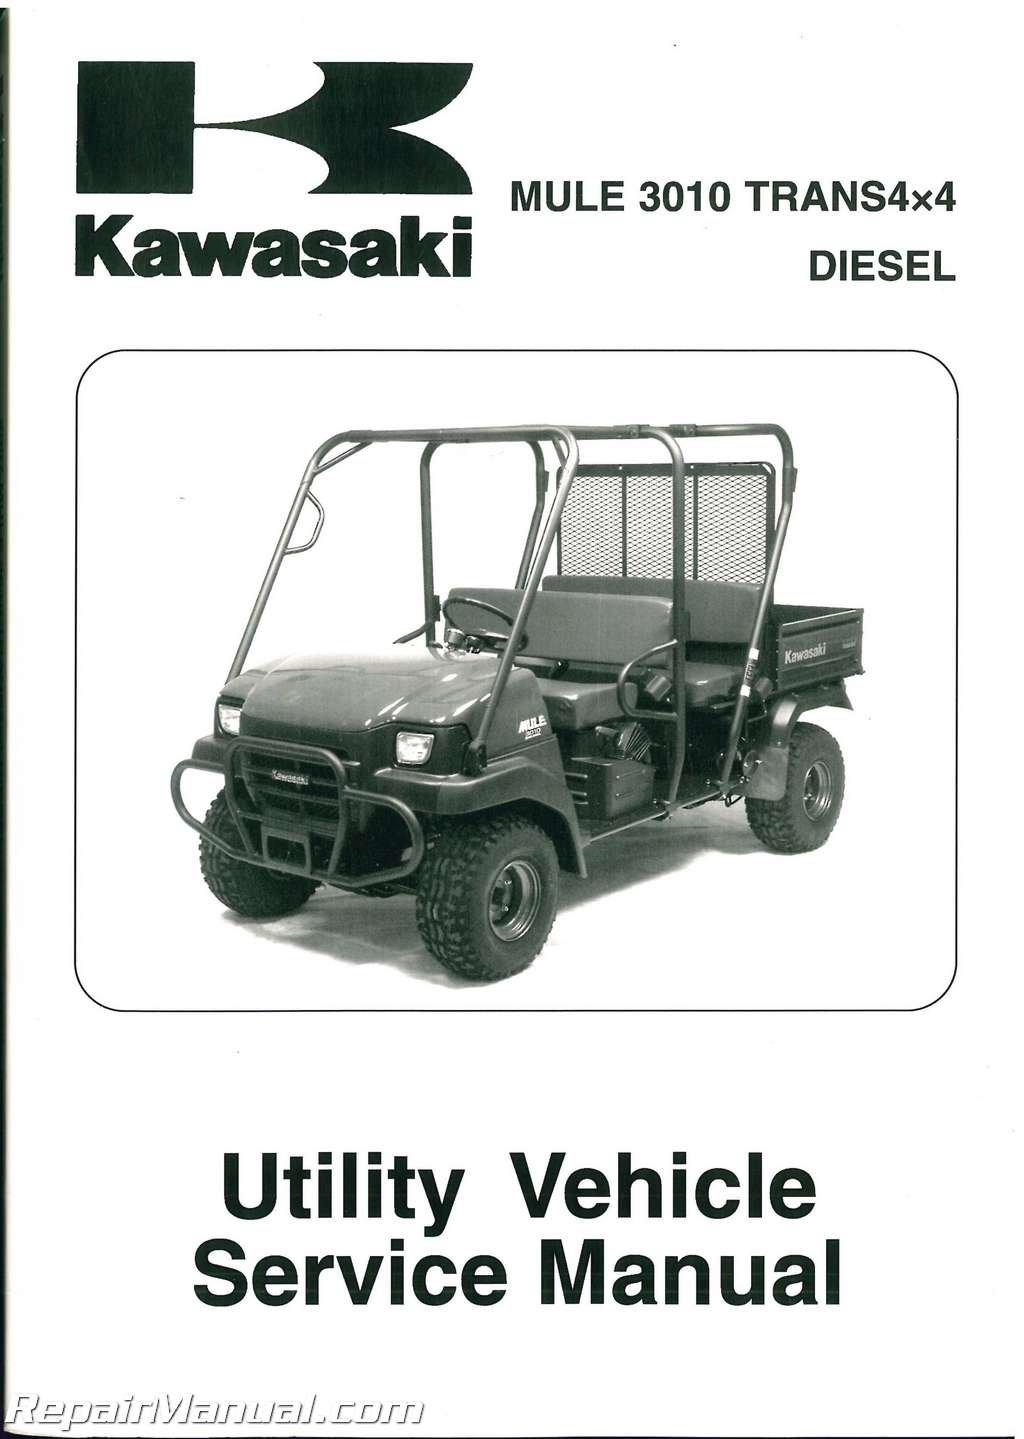 99924-1368-02 2007 Kawasaki KAF950C MULE 3010 Trans4x4 Diesel Service Manual:  Manufacturer: Amazon.com: Books